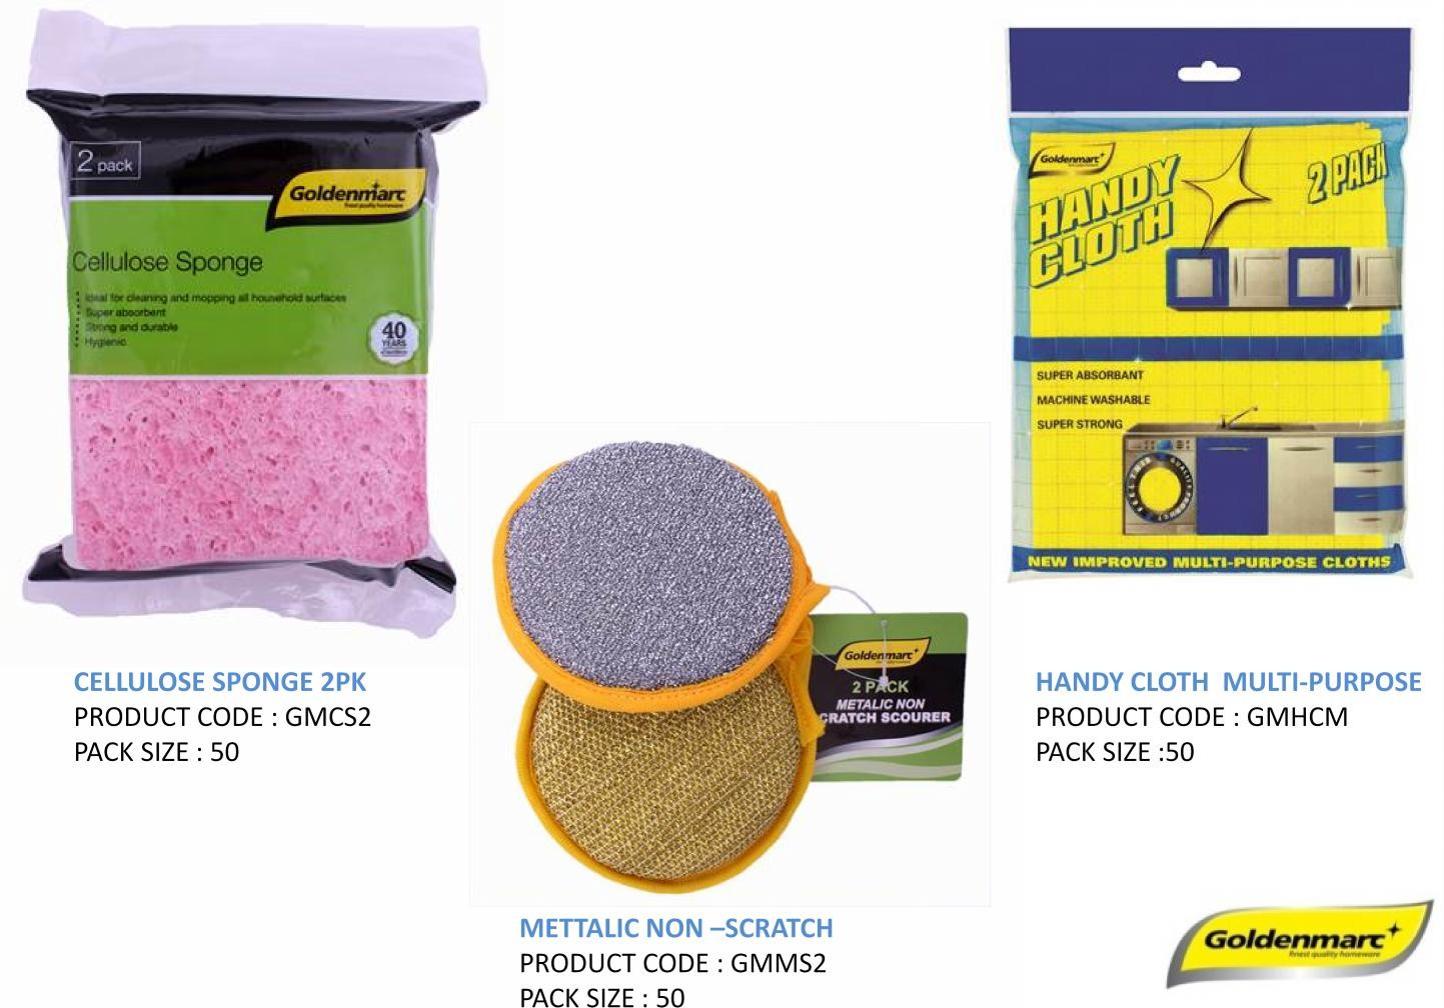 Cellulose Sponge - Metallic Non - scratch - handy cloth.png